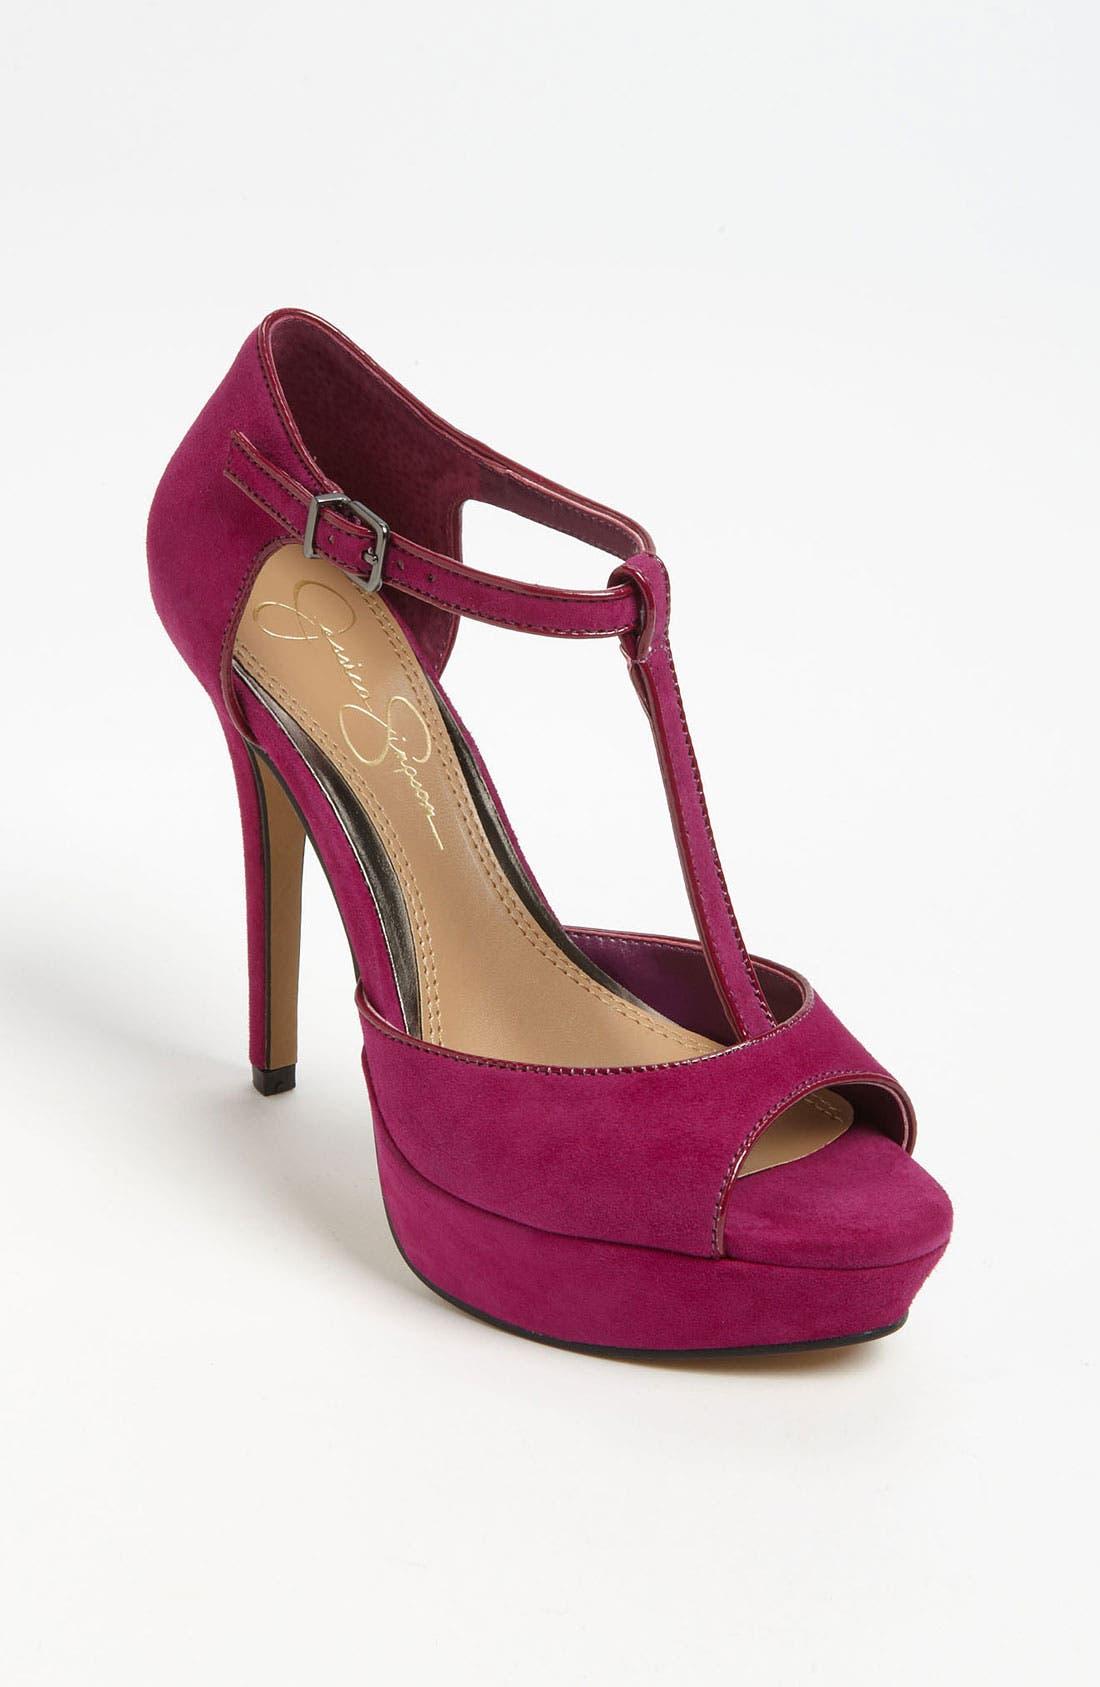 Main Image - Jessica Simpson 'Bansi' Sandal